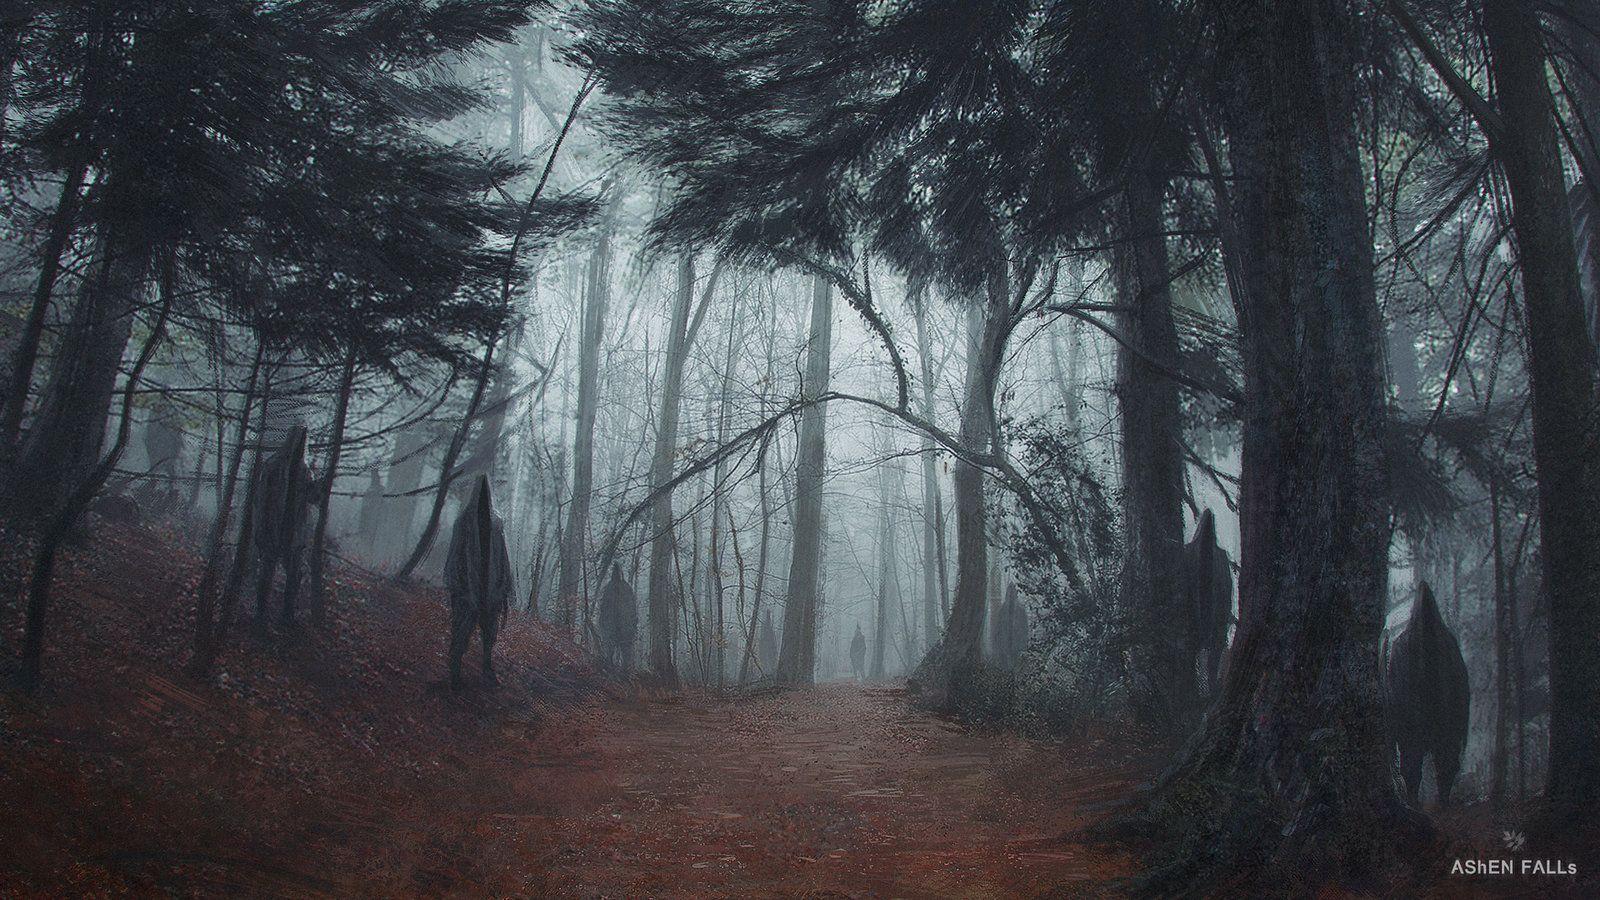 Ashen Falls - The Forest, Gilles Ketting on ArtStation at https://www.artstation.com/artwork/ashen-falls-the-forest